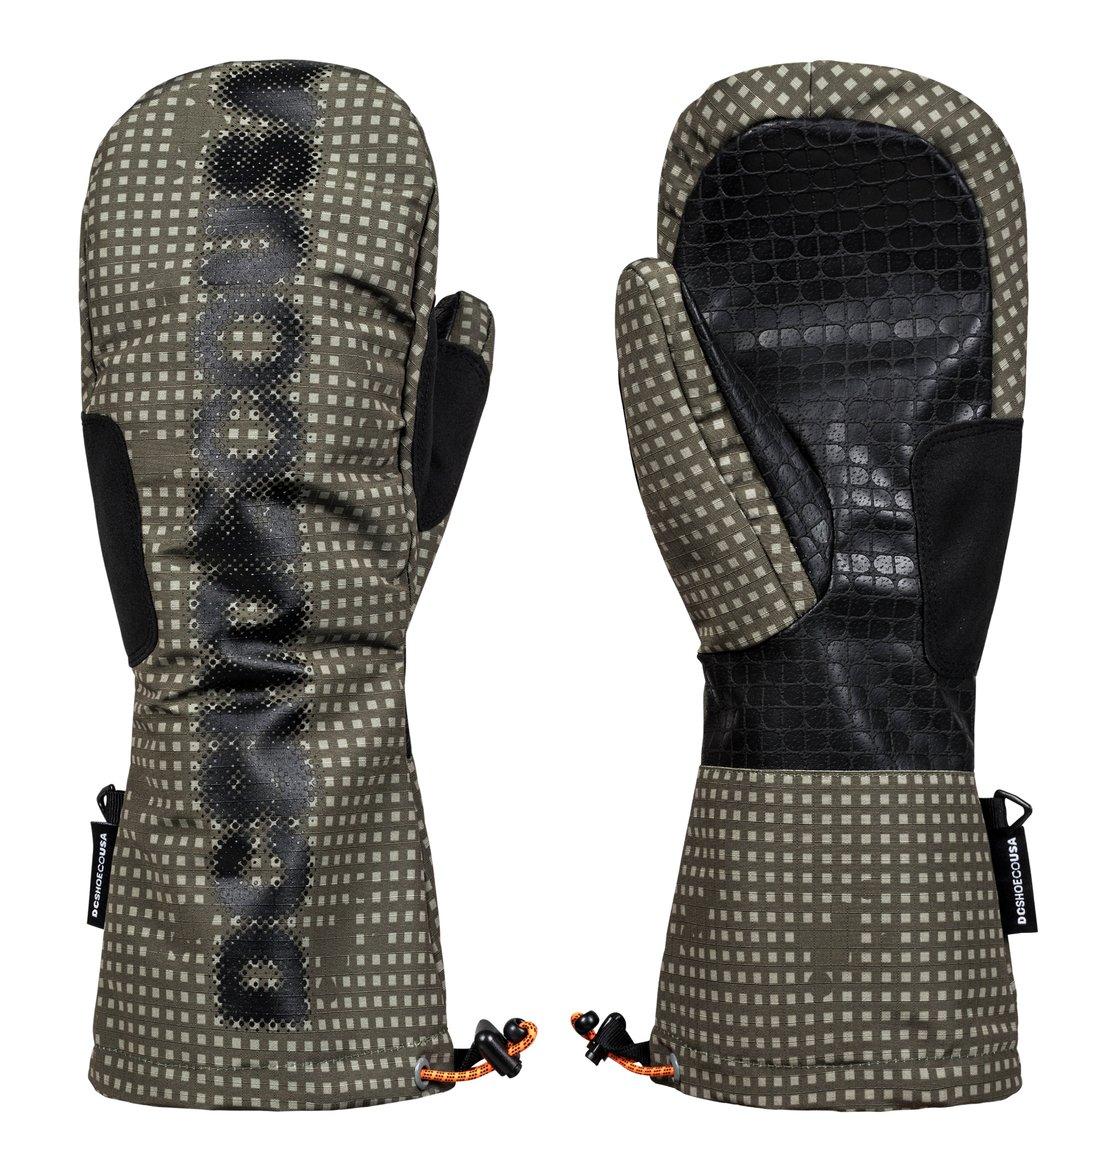 DC Shoes Snowboardhandschuhe Headline | Accessoires > Handschuhe > Sonstige Handschuhe | Dc Shoes